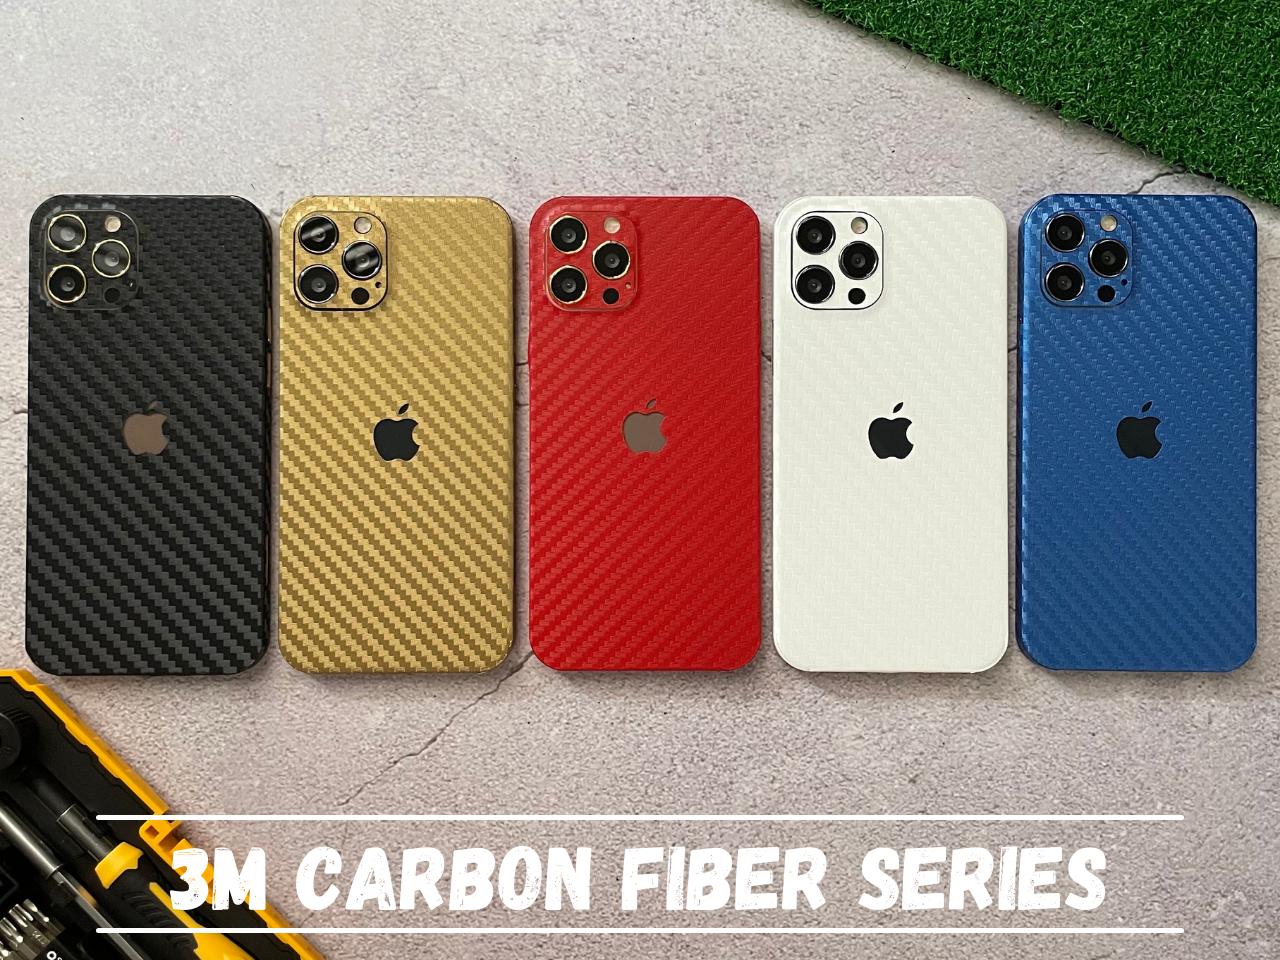 Mojoskins 3M Carbon Fiber Series